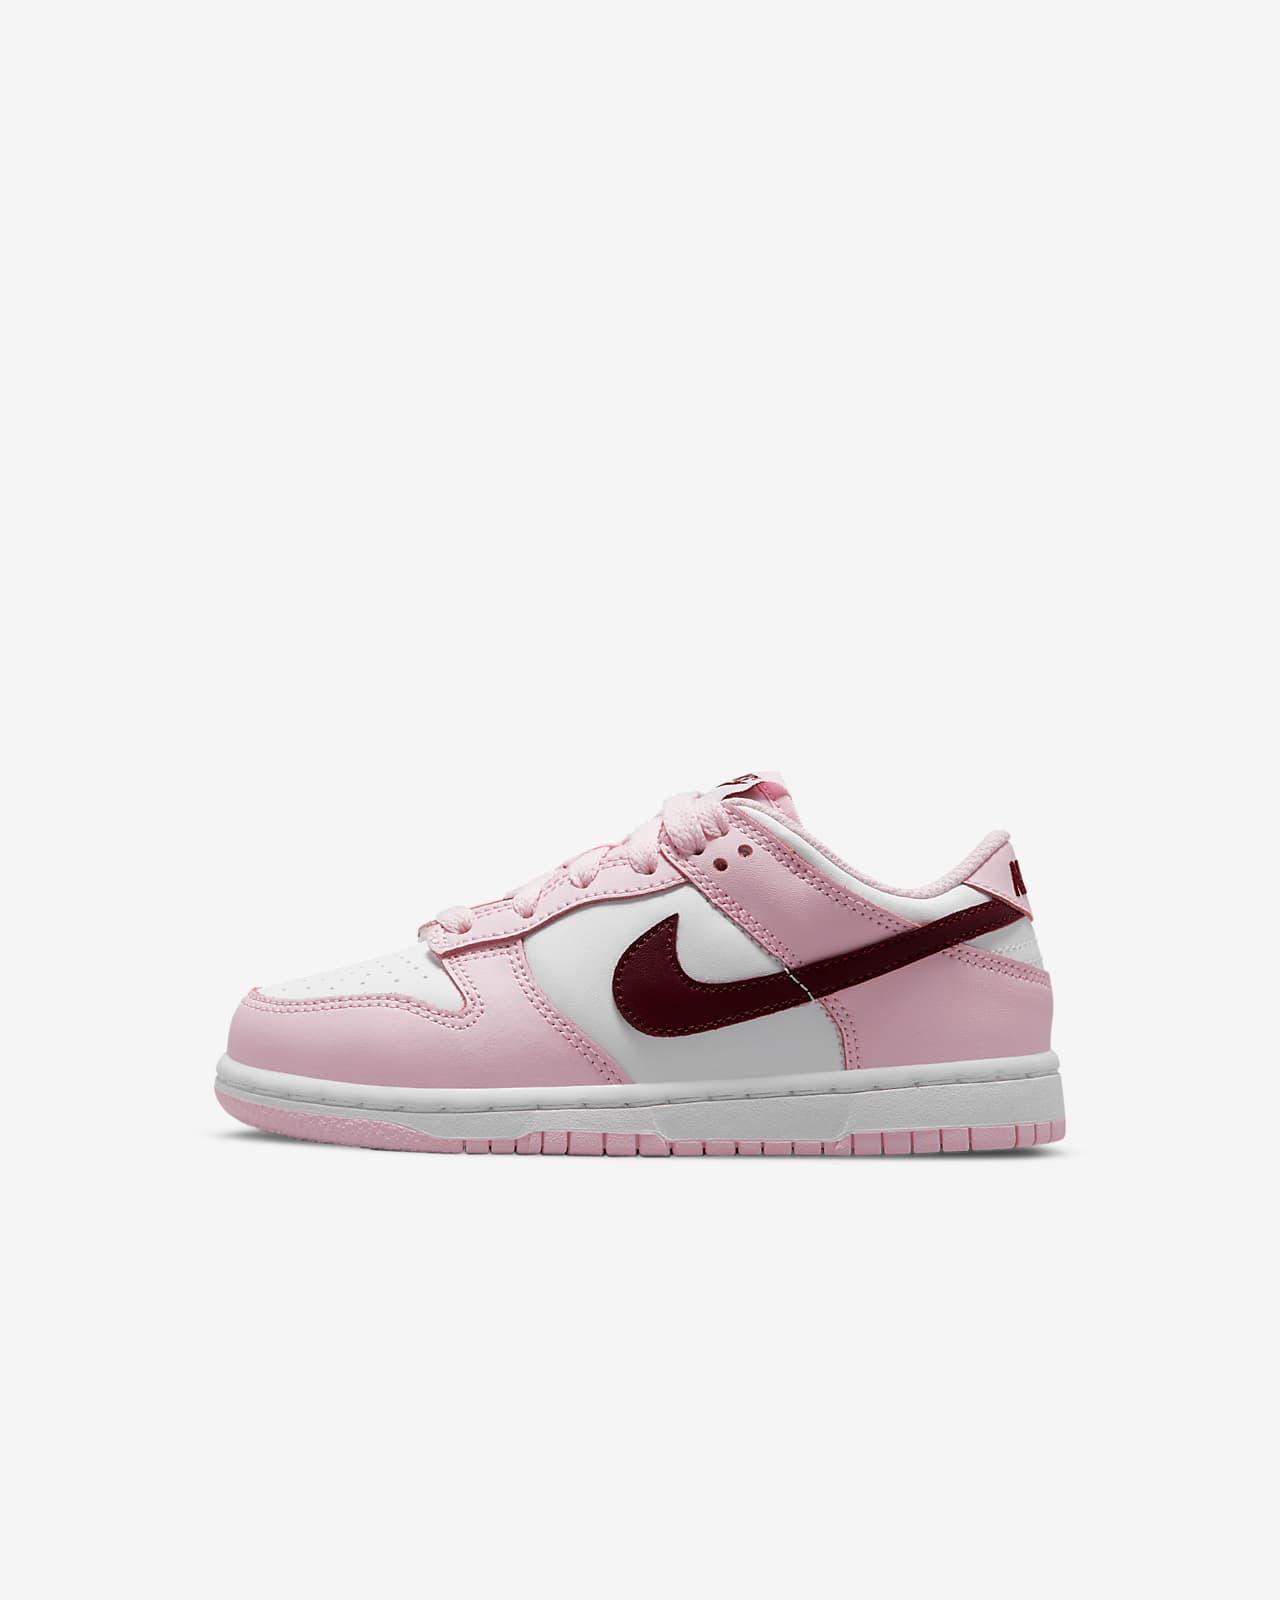 Nike Dunk Low Younger Kids' Shoe